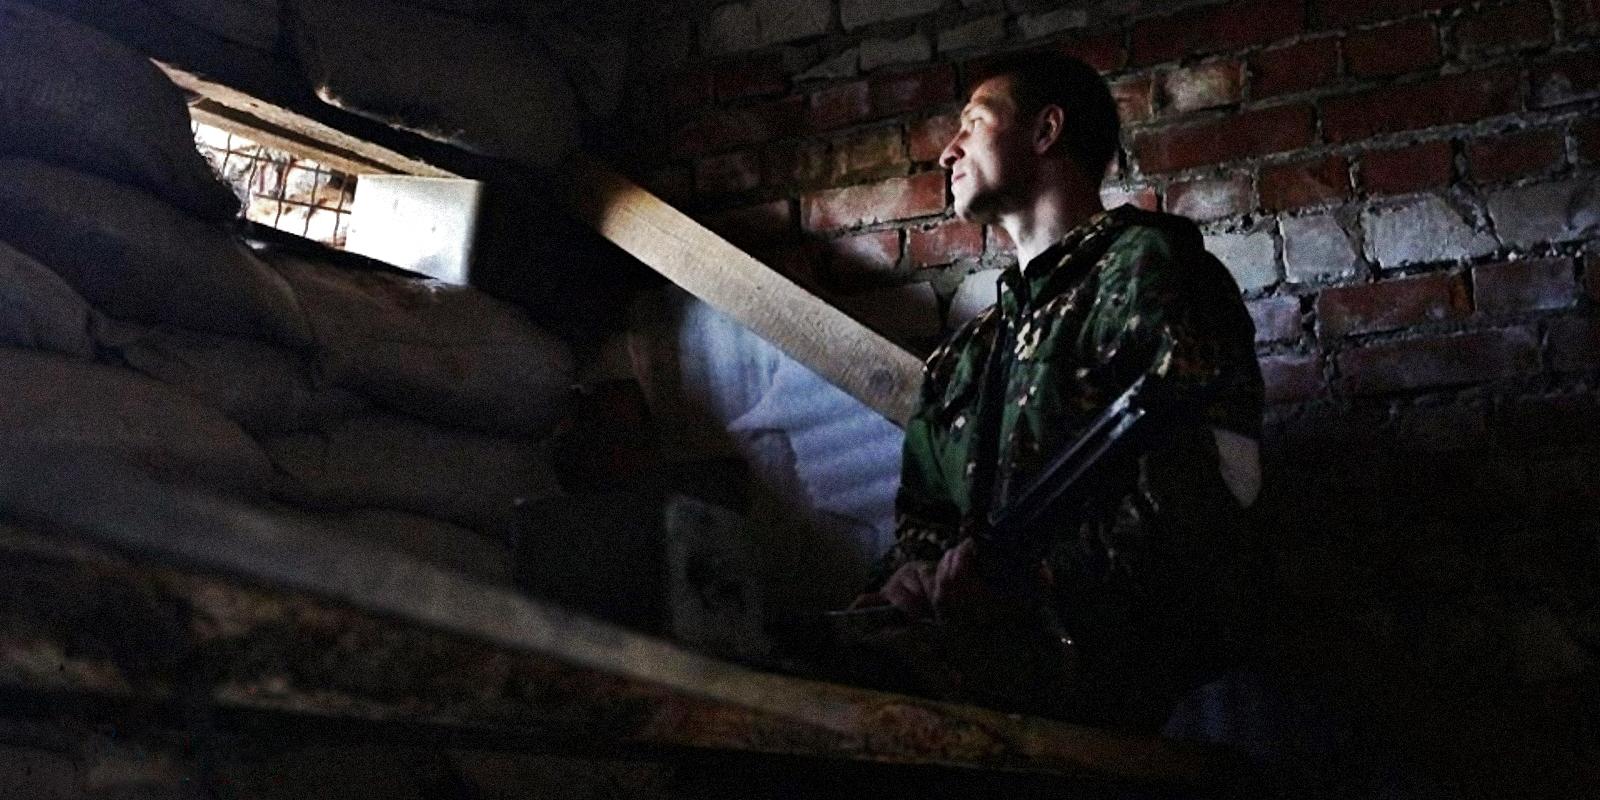 00 dnr donetsk pr soldier 01 200815